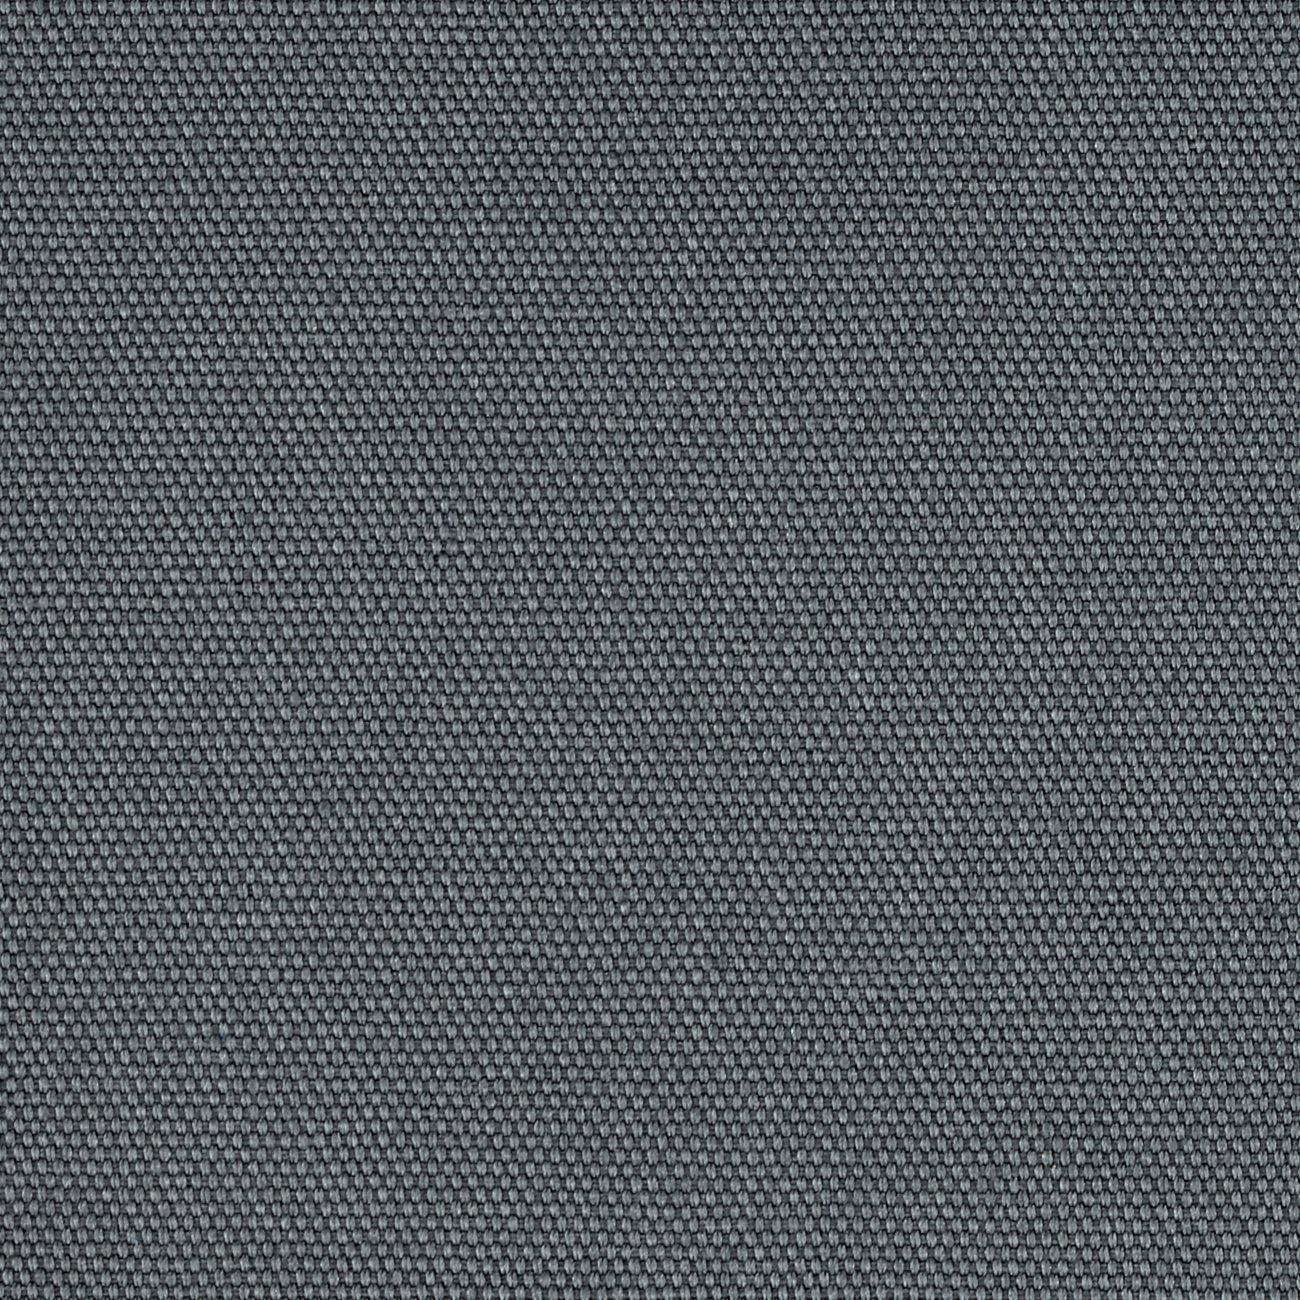 eb2873022d5 Amazon.com: Robert Kaufman 0429854 Kaufman Big Sur Canvas Solid Gray Fabric  by The Yard